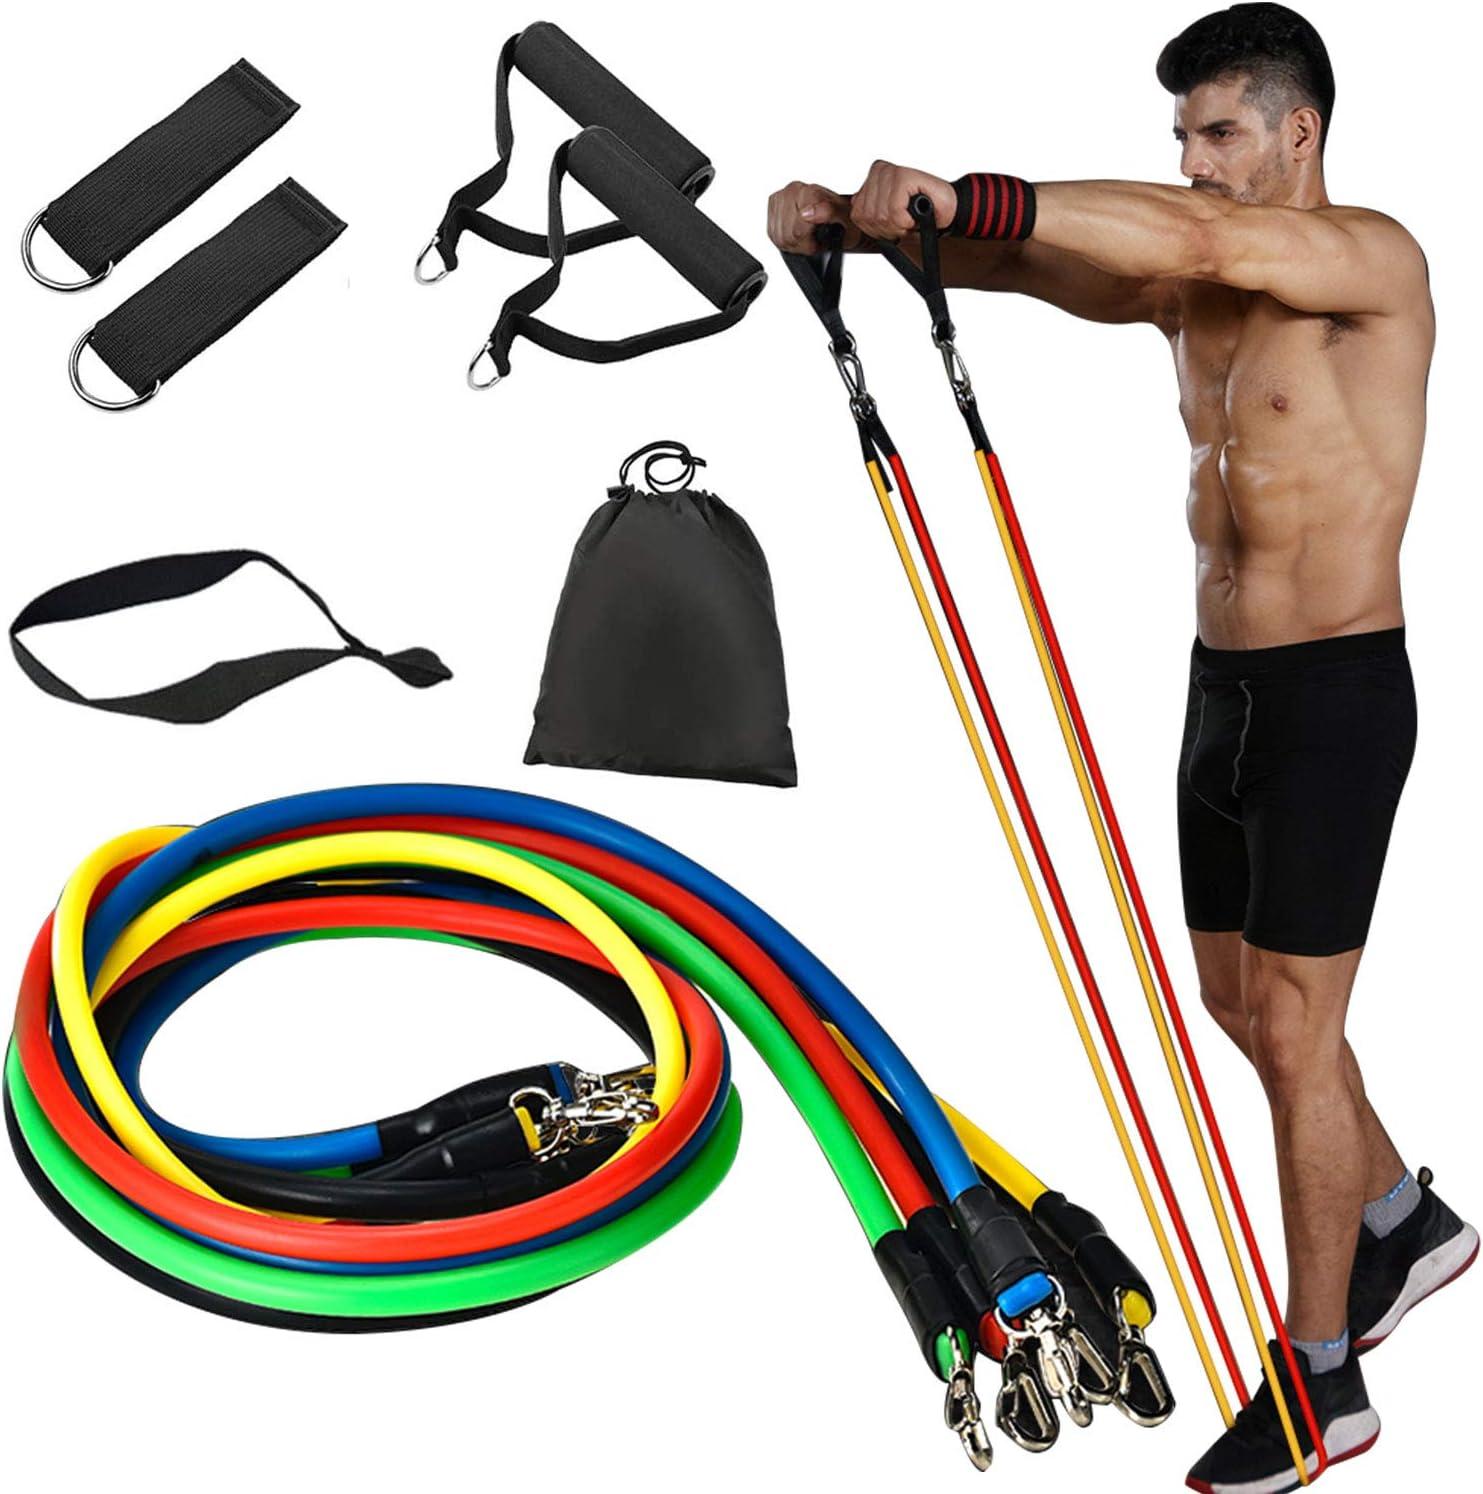 Handles Waterproof bag 11 PCs Resistance Exercise  Bands Set with Door Anchor